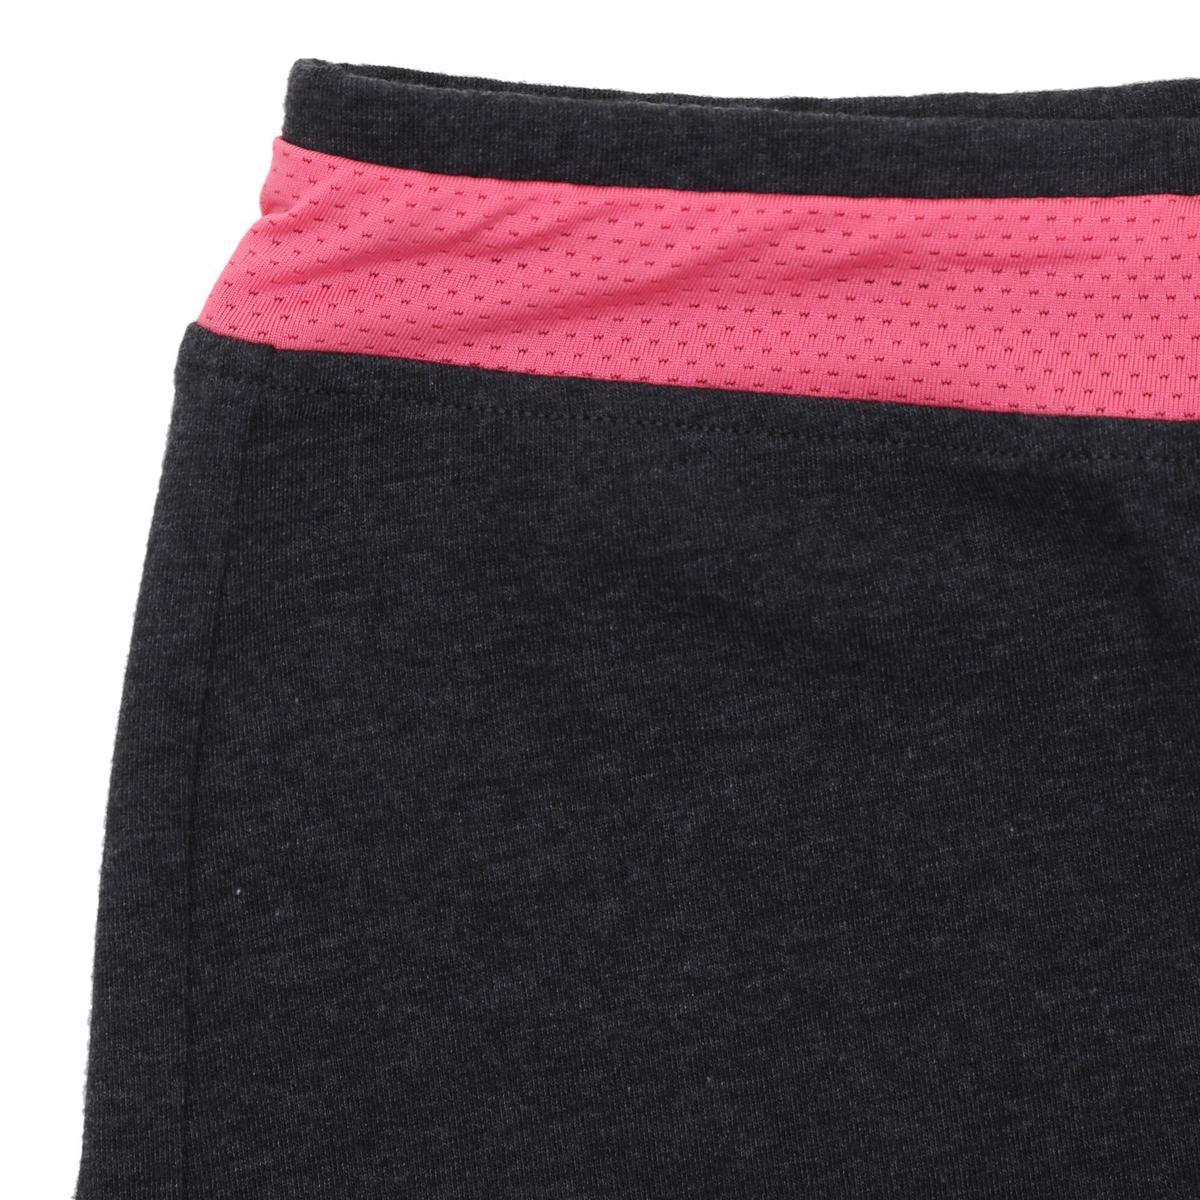 Bild 3 von Sporthose kurz 500 Gym Kinder grau/rosa mit Print